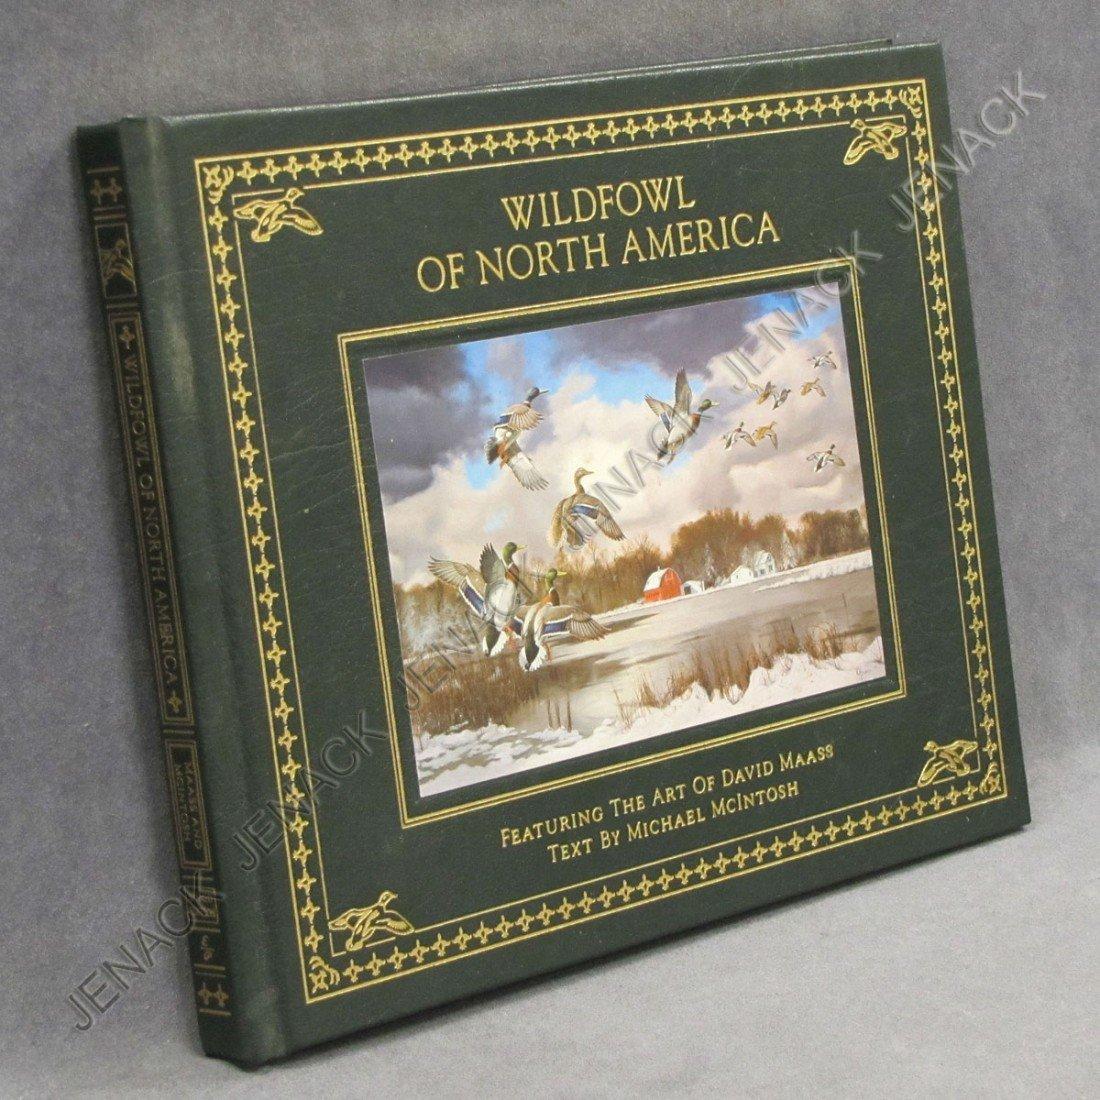 13: VOLUME-WILDFOWL OF NORTH AMERICA, DAVID MAASS